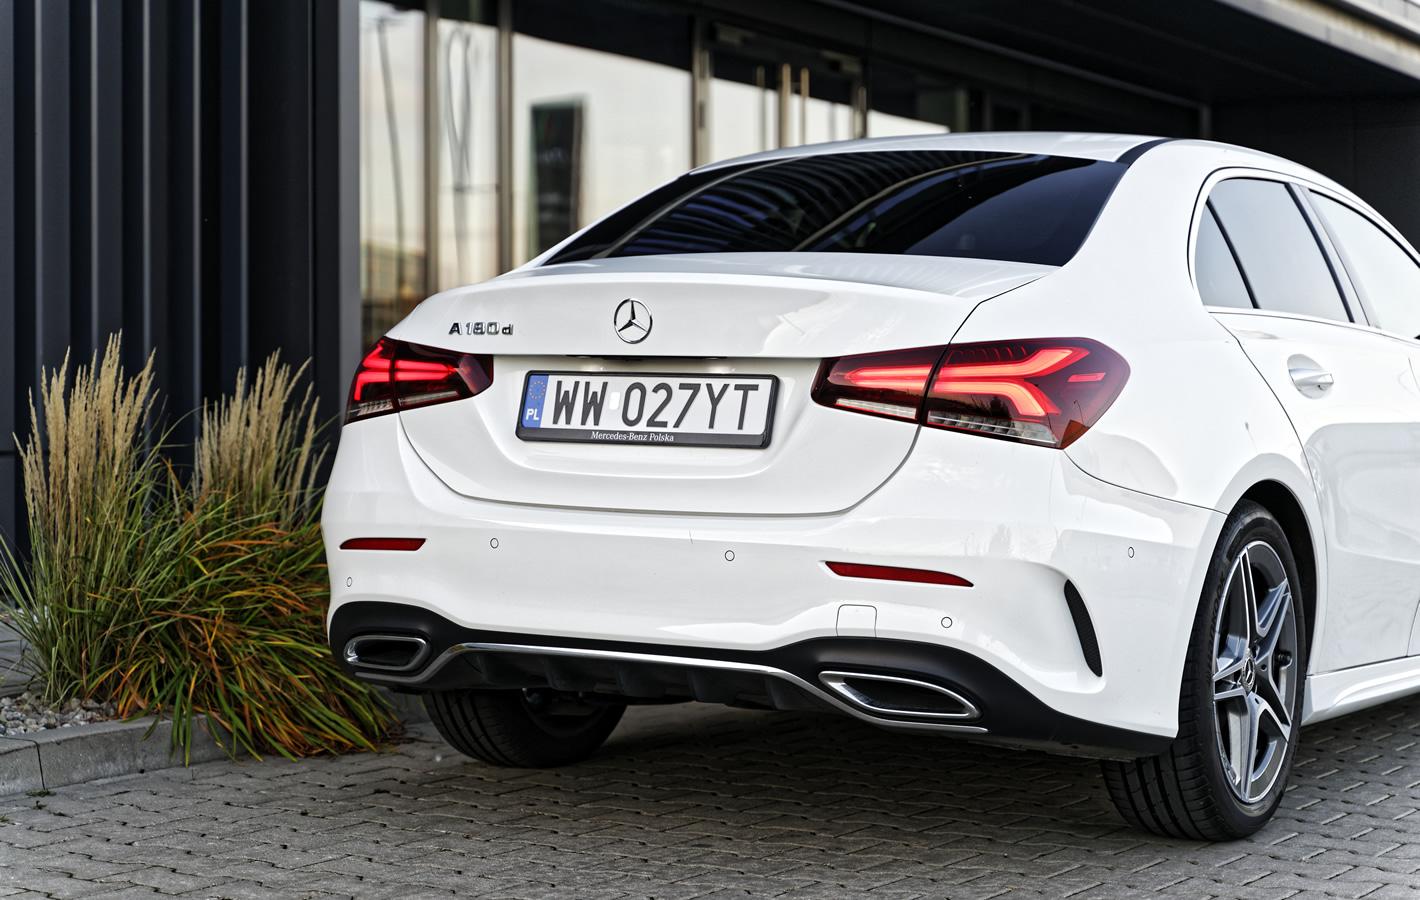 Mercedes-Benz A 180d Limuzyna